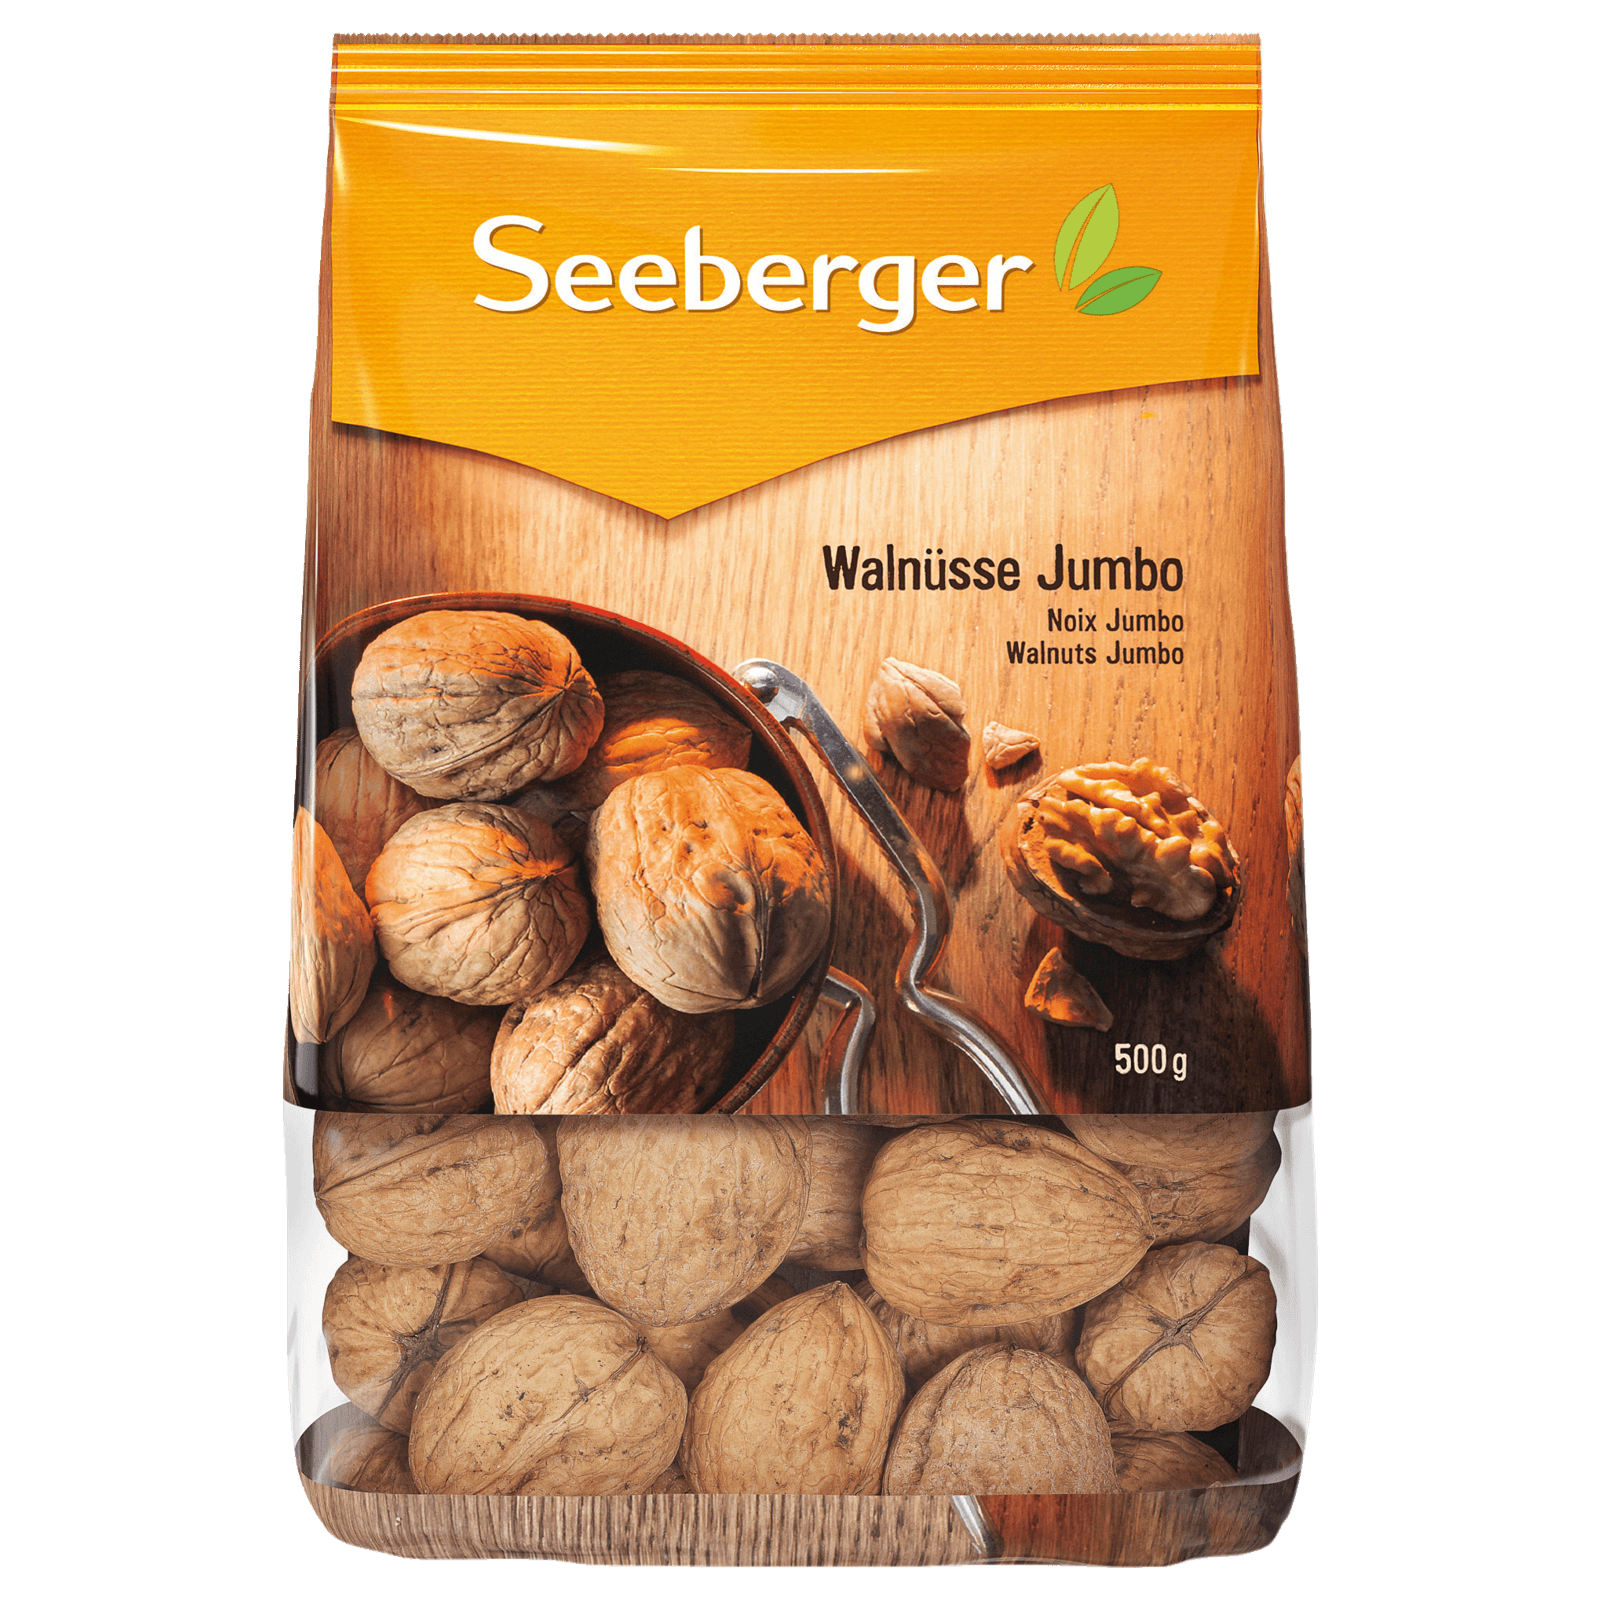 Berühmt Seeberger Walnüsse Jumbo 500g bei REWE online bestellen! &UU_71